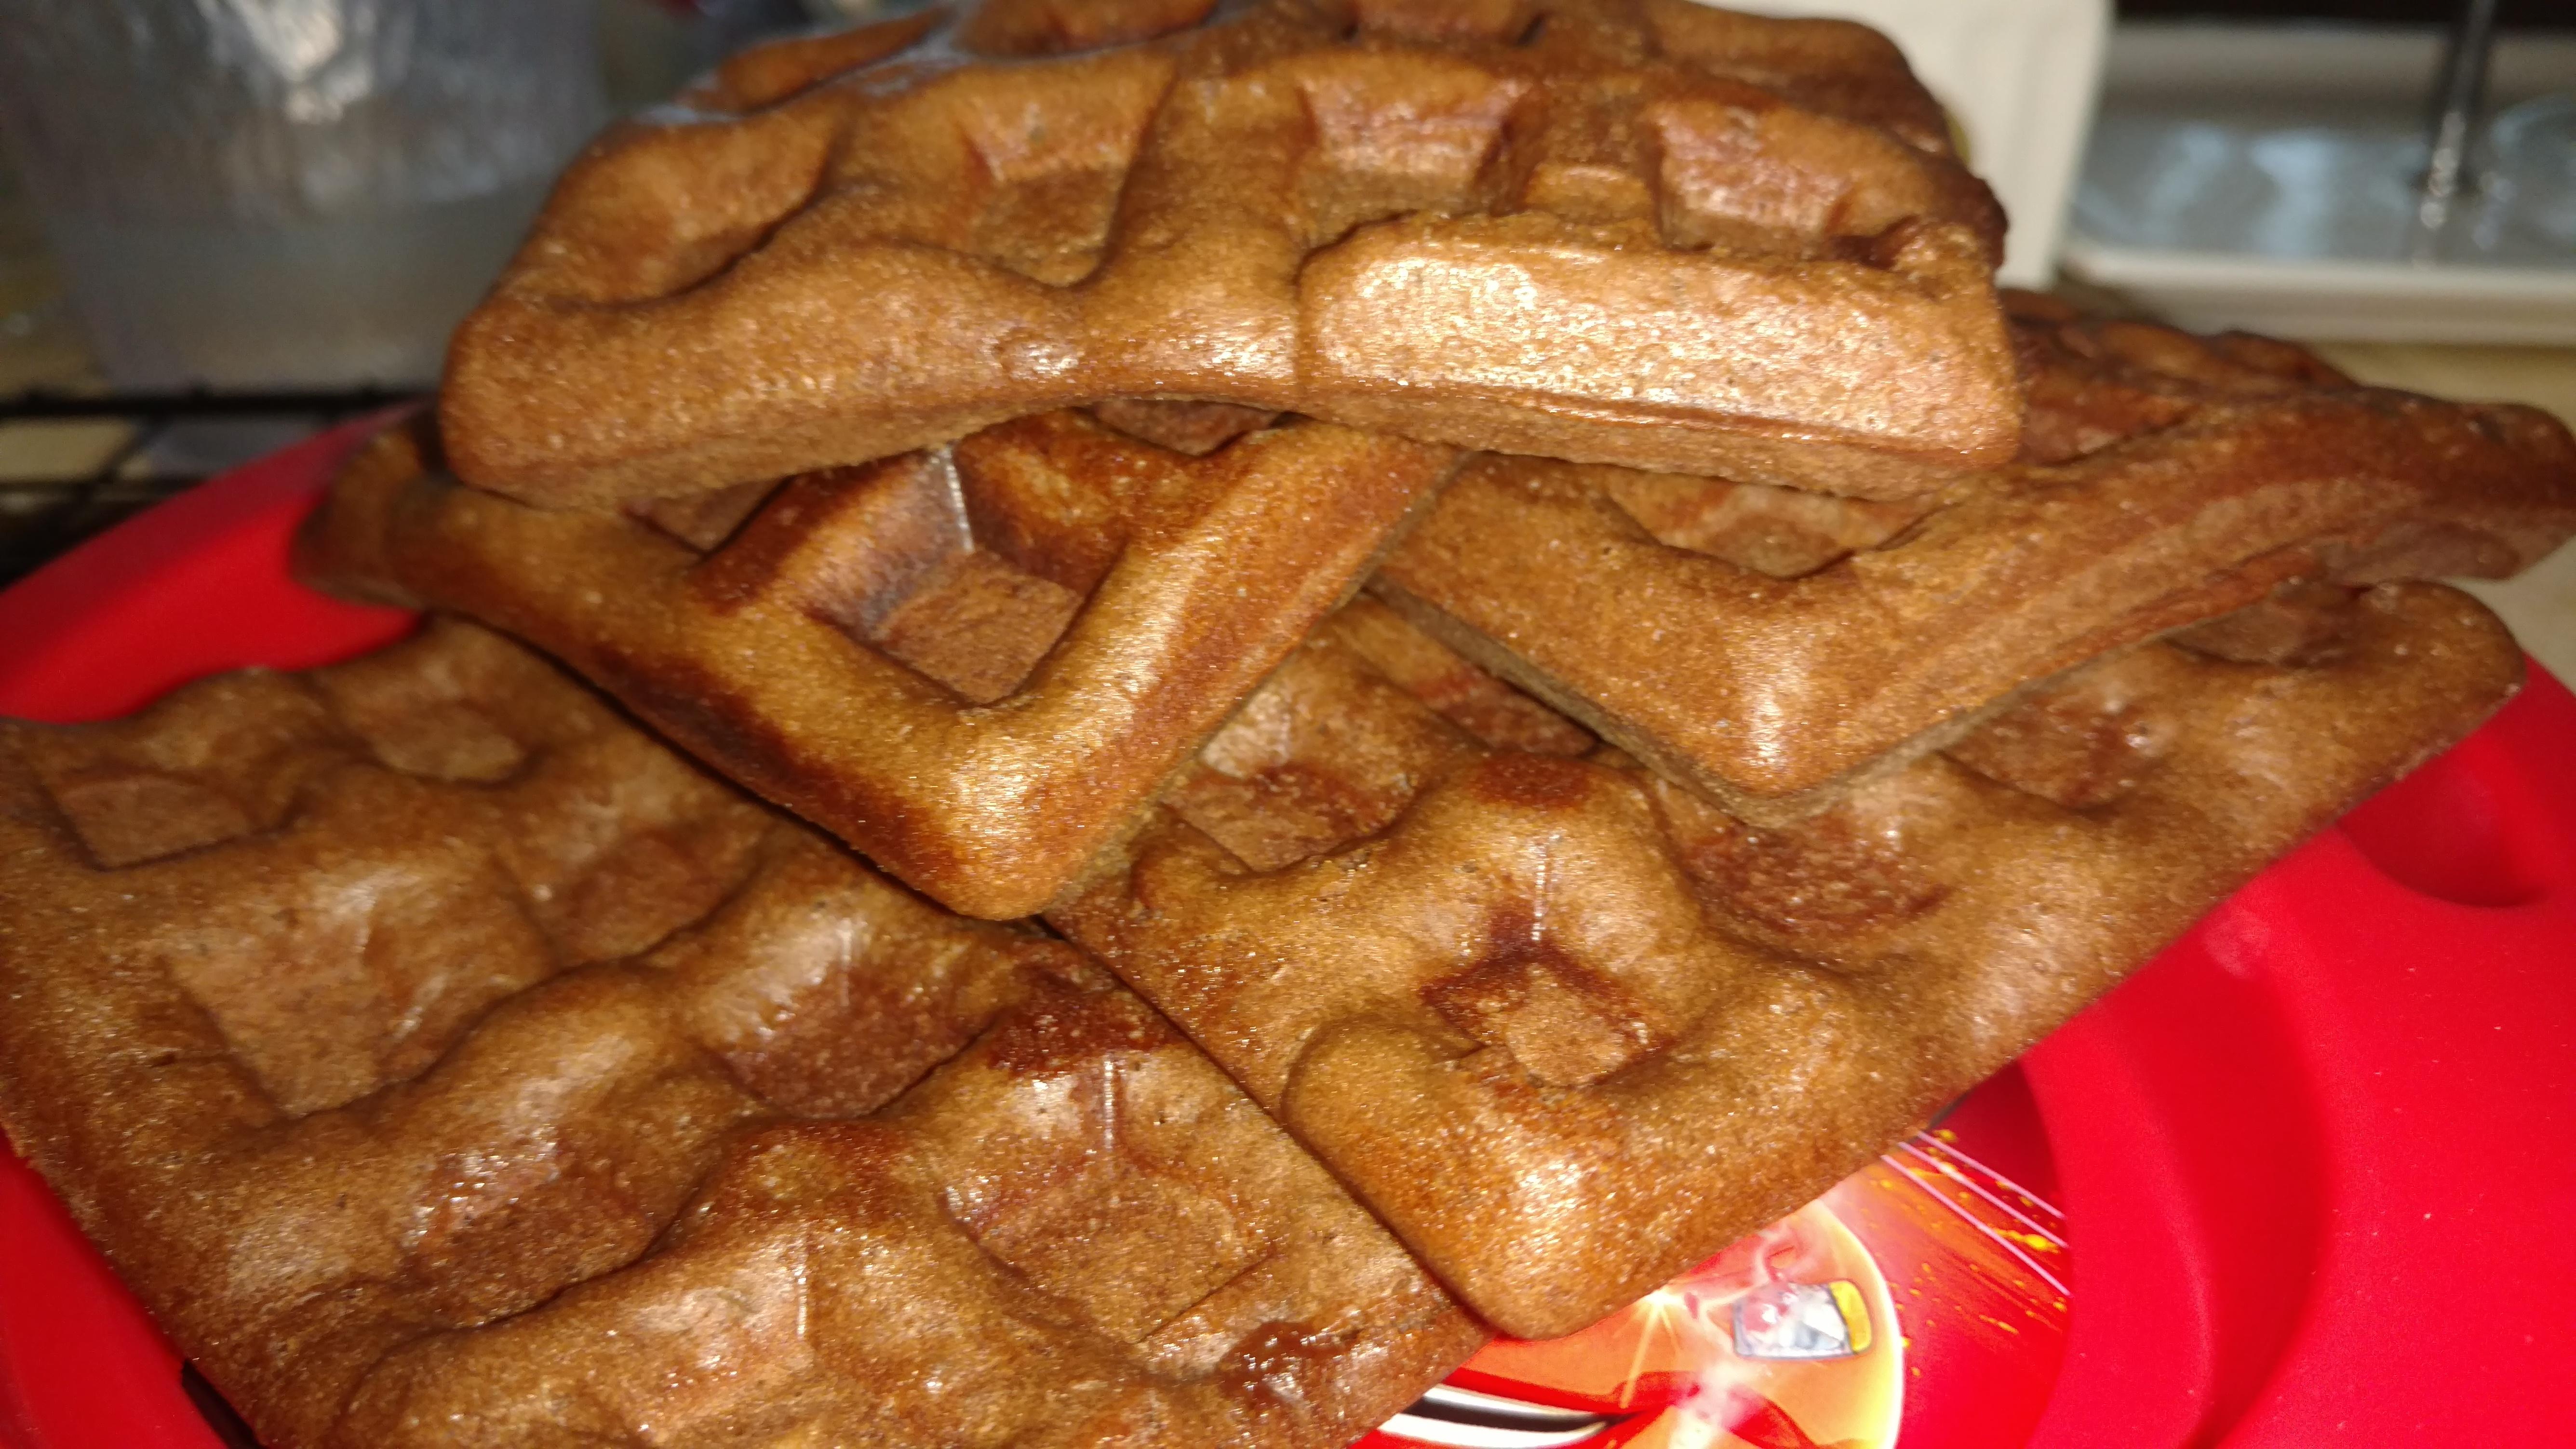 Wonderful Chocolate Waffles Recipe - Food.com